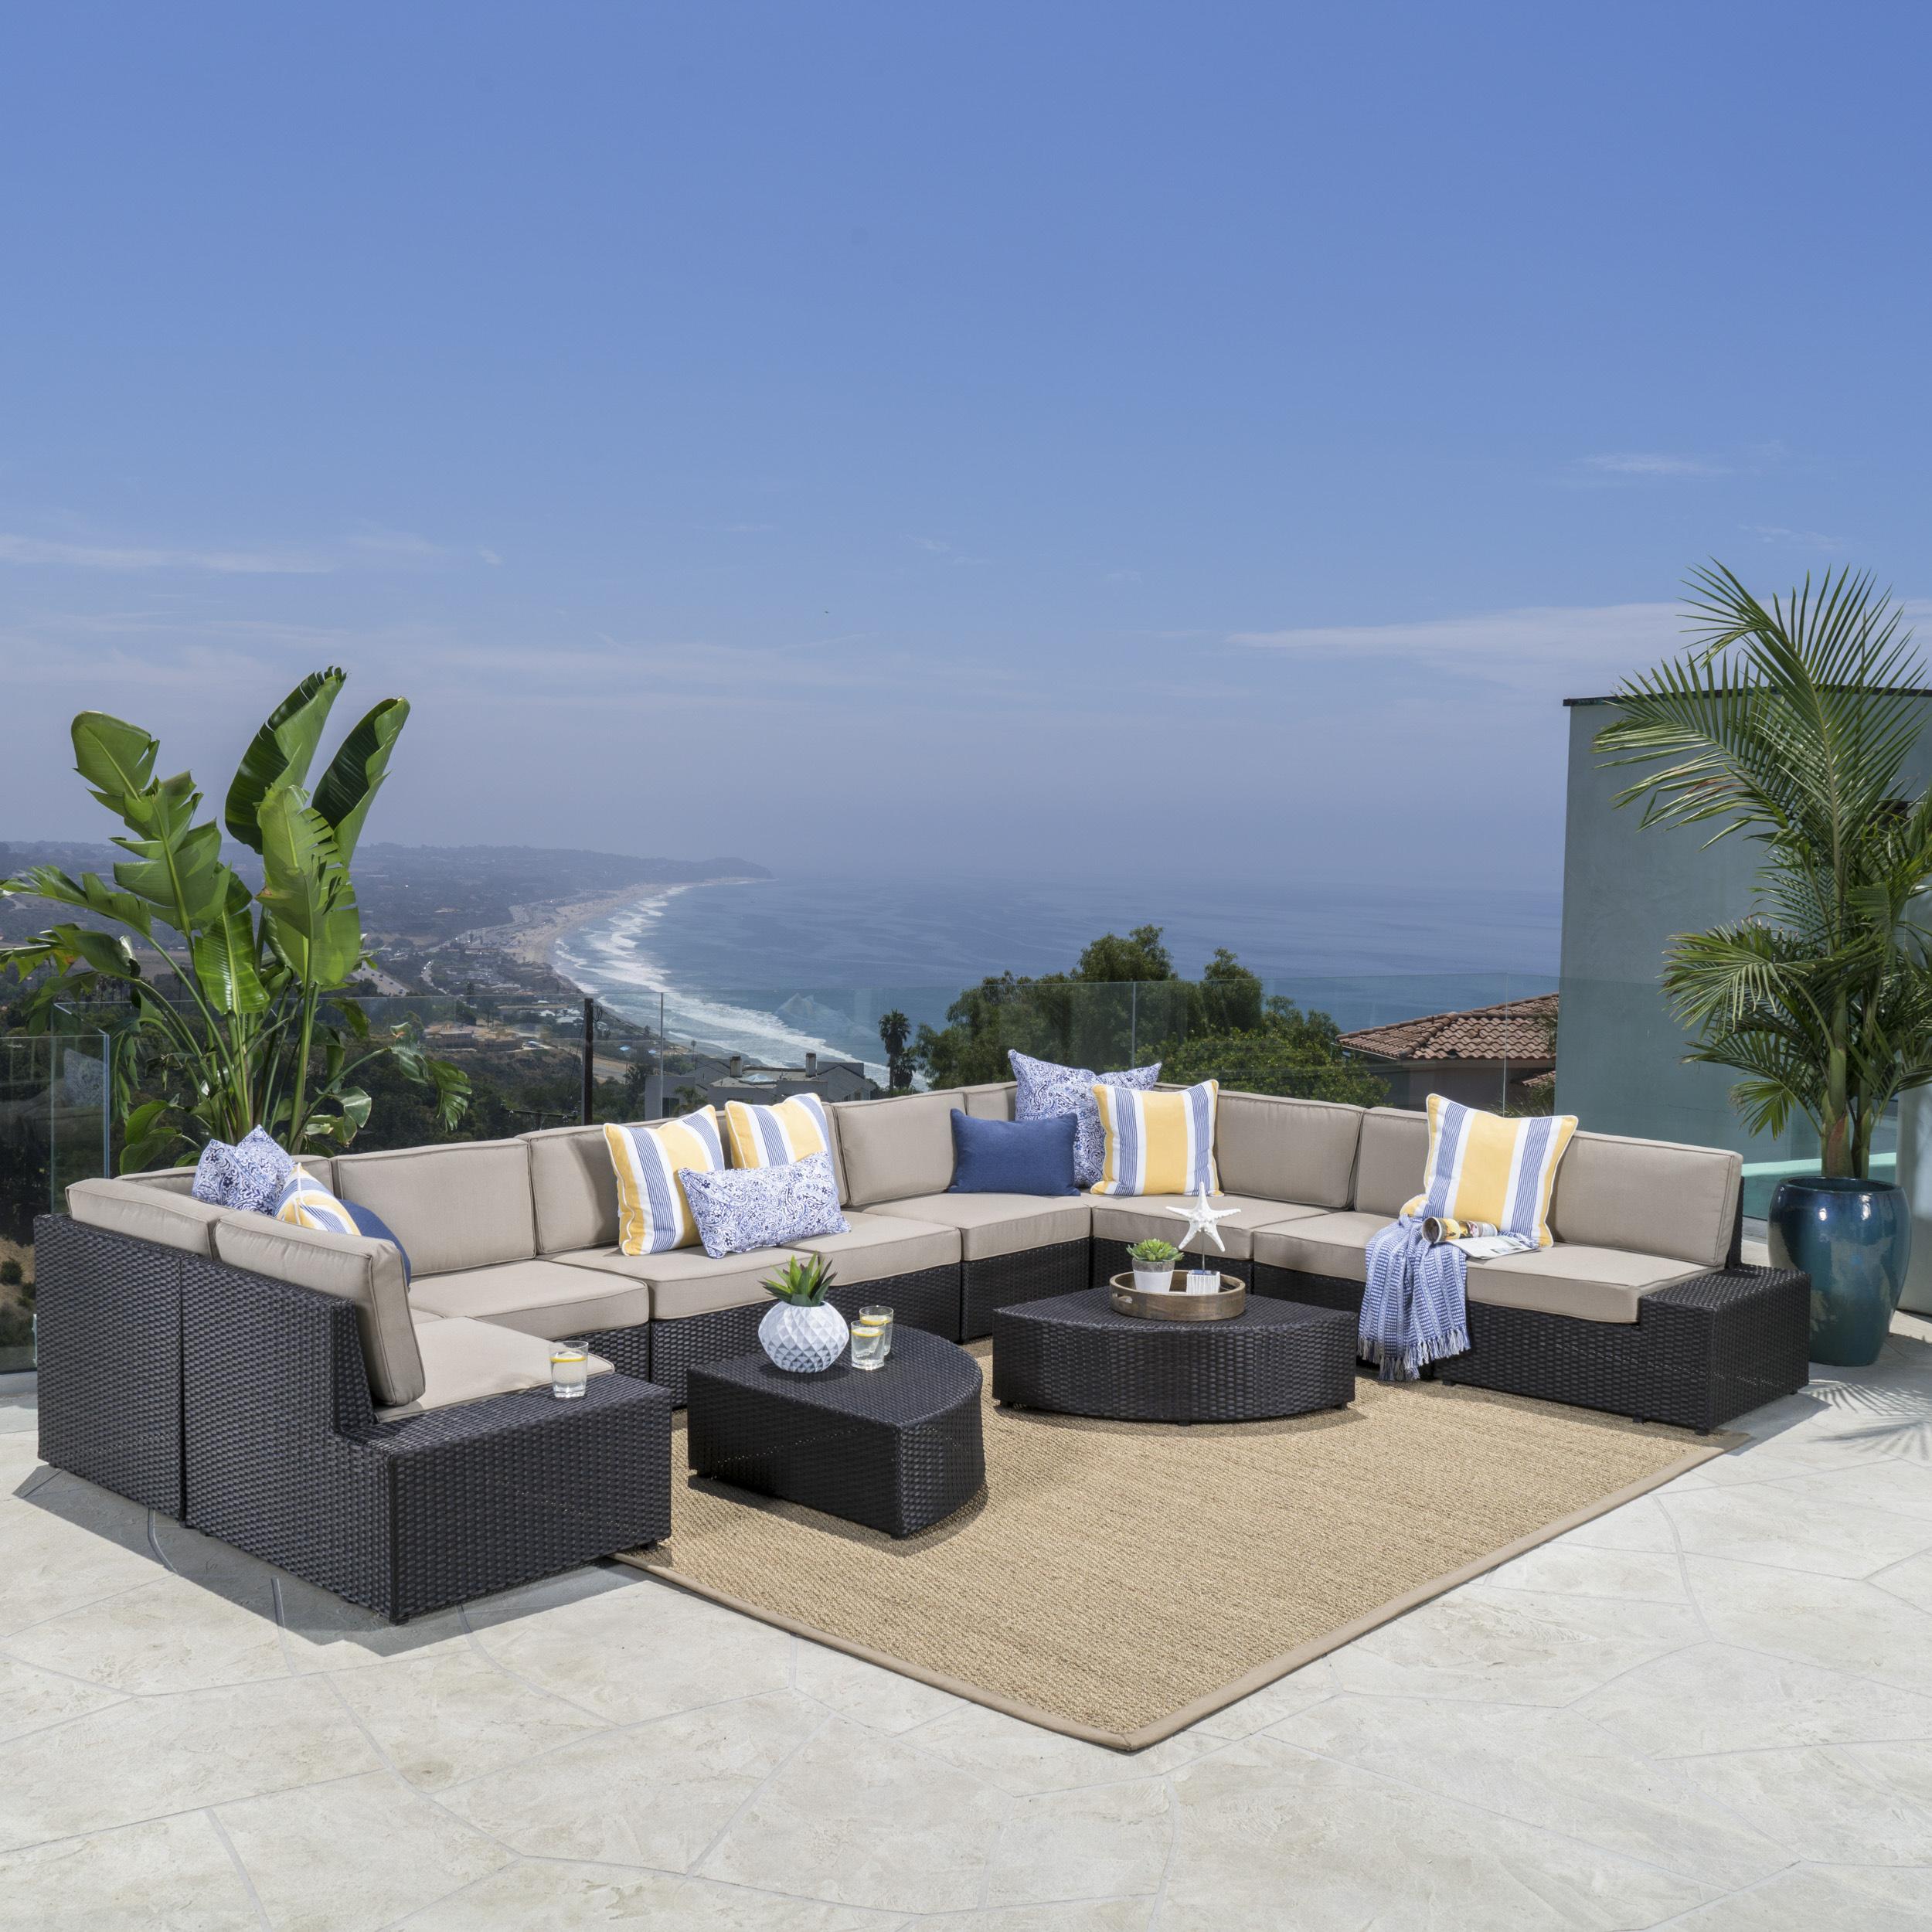 Keyston 12 Piece Outdoor Wicker Sofa Set with Cushions, Brown